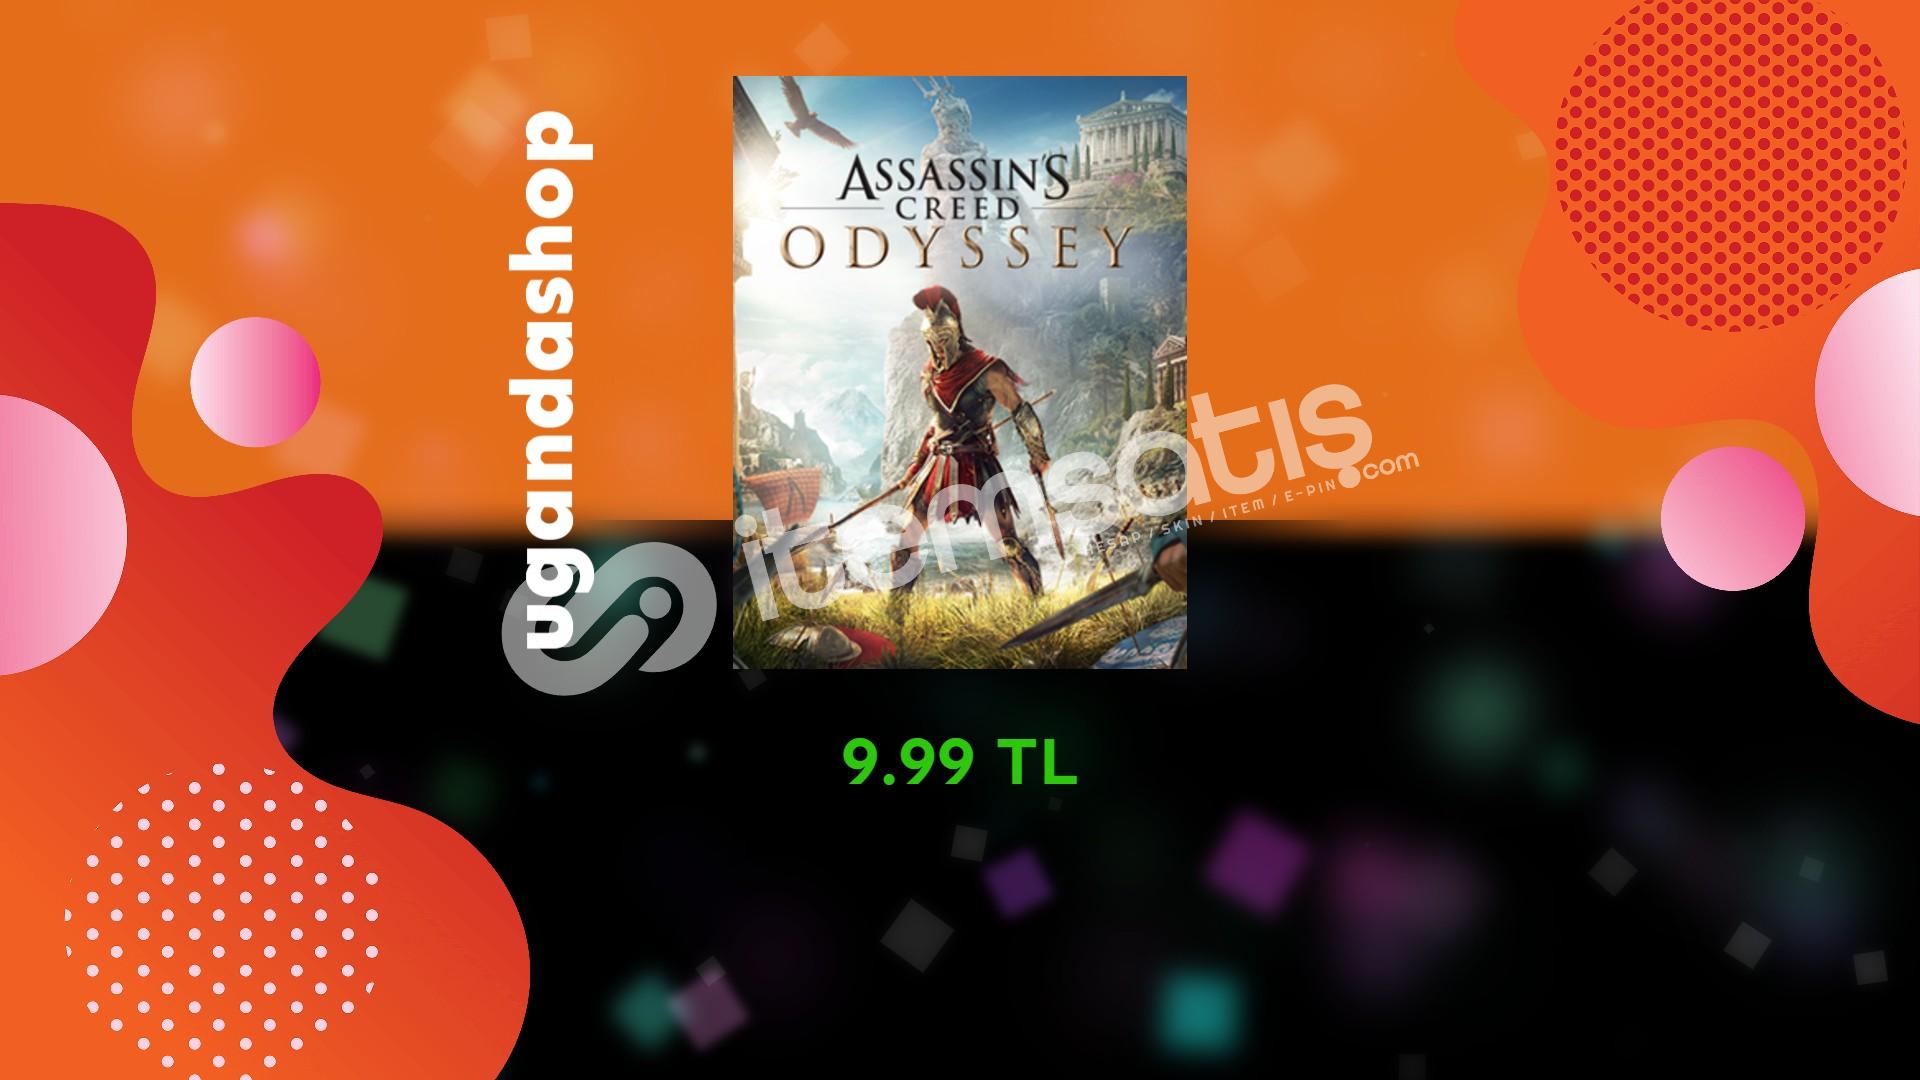 Assassin's Creed Odyssey Online Uplay/Ubisoft Hesap